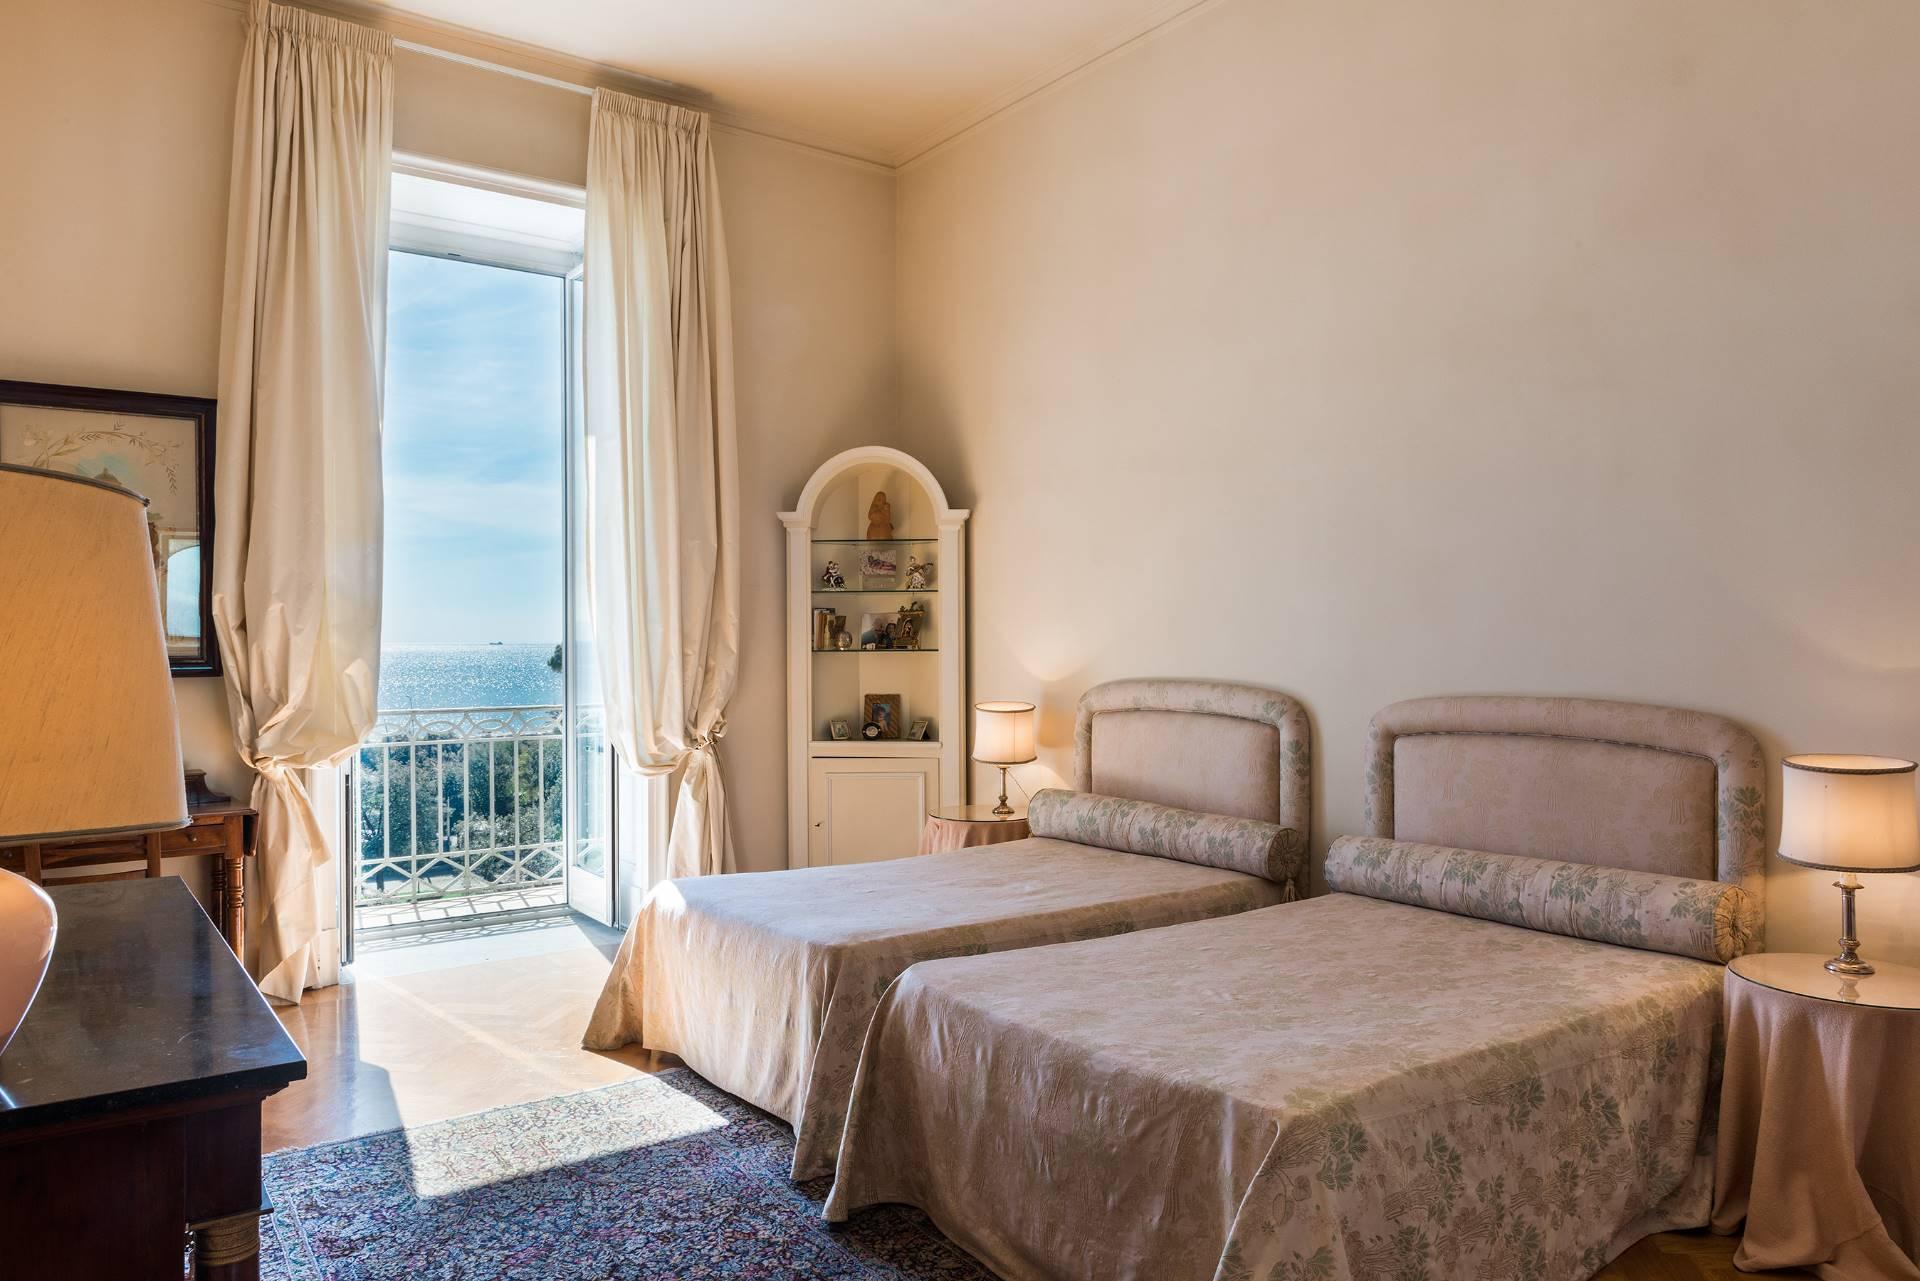 Stylish apartment with seaviews - 13